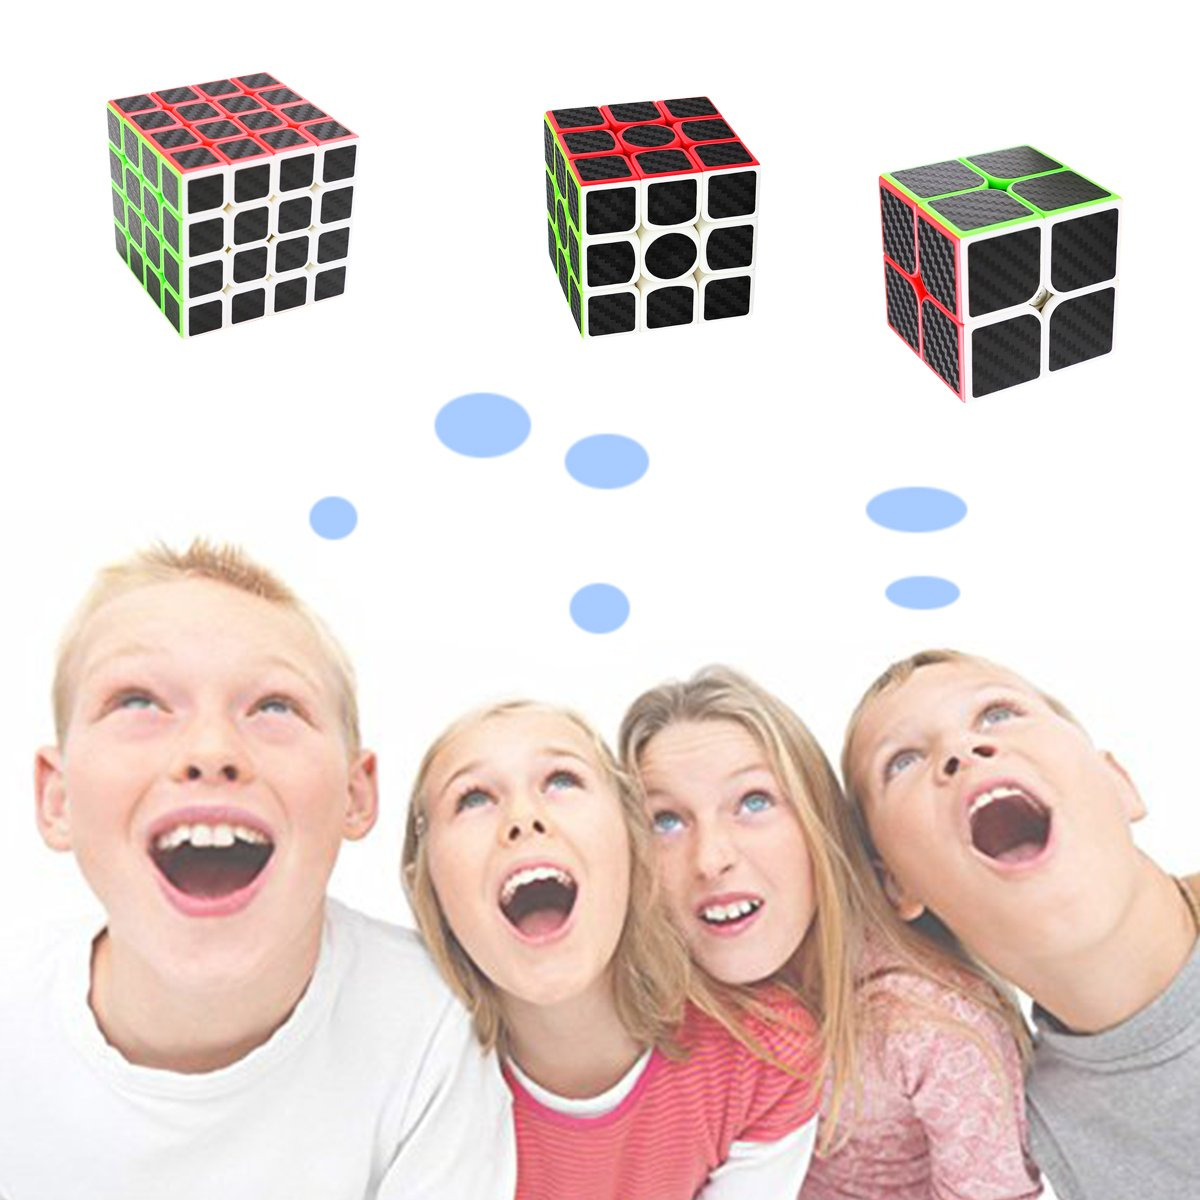 Speed Cube Fibra Carbono Cubo Velocidad Puzzle Cubos Juegos Inteligencia COOJA Cube Pack 2x2 3x3 4x4